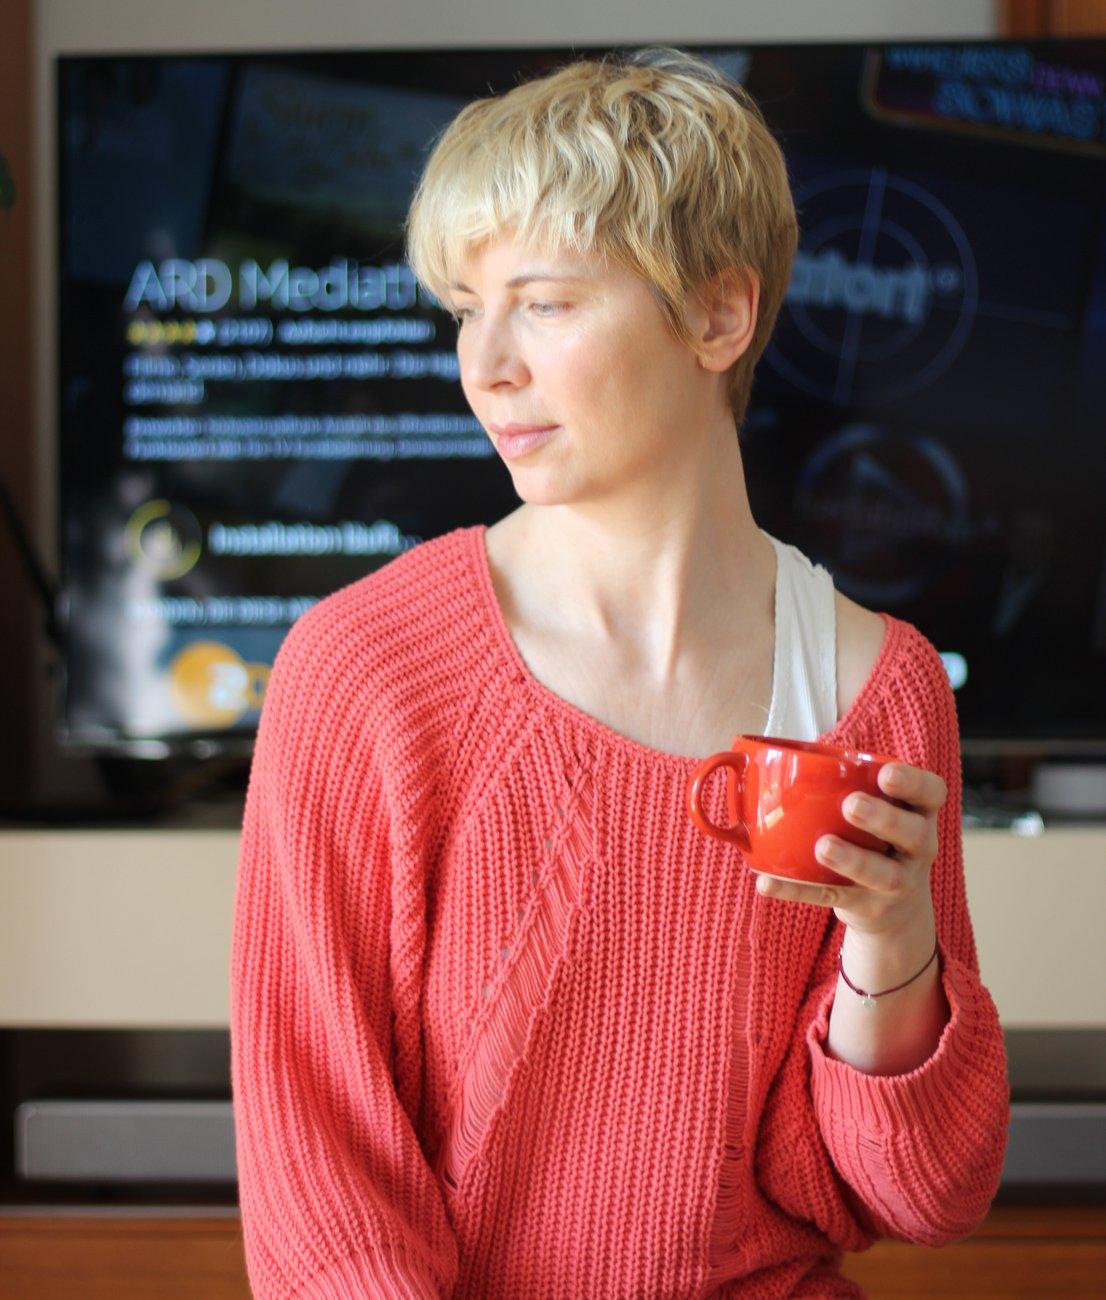 conny doll lifestyle: watchliste, Streamingdienst, TV, Quarantäne